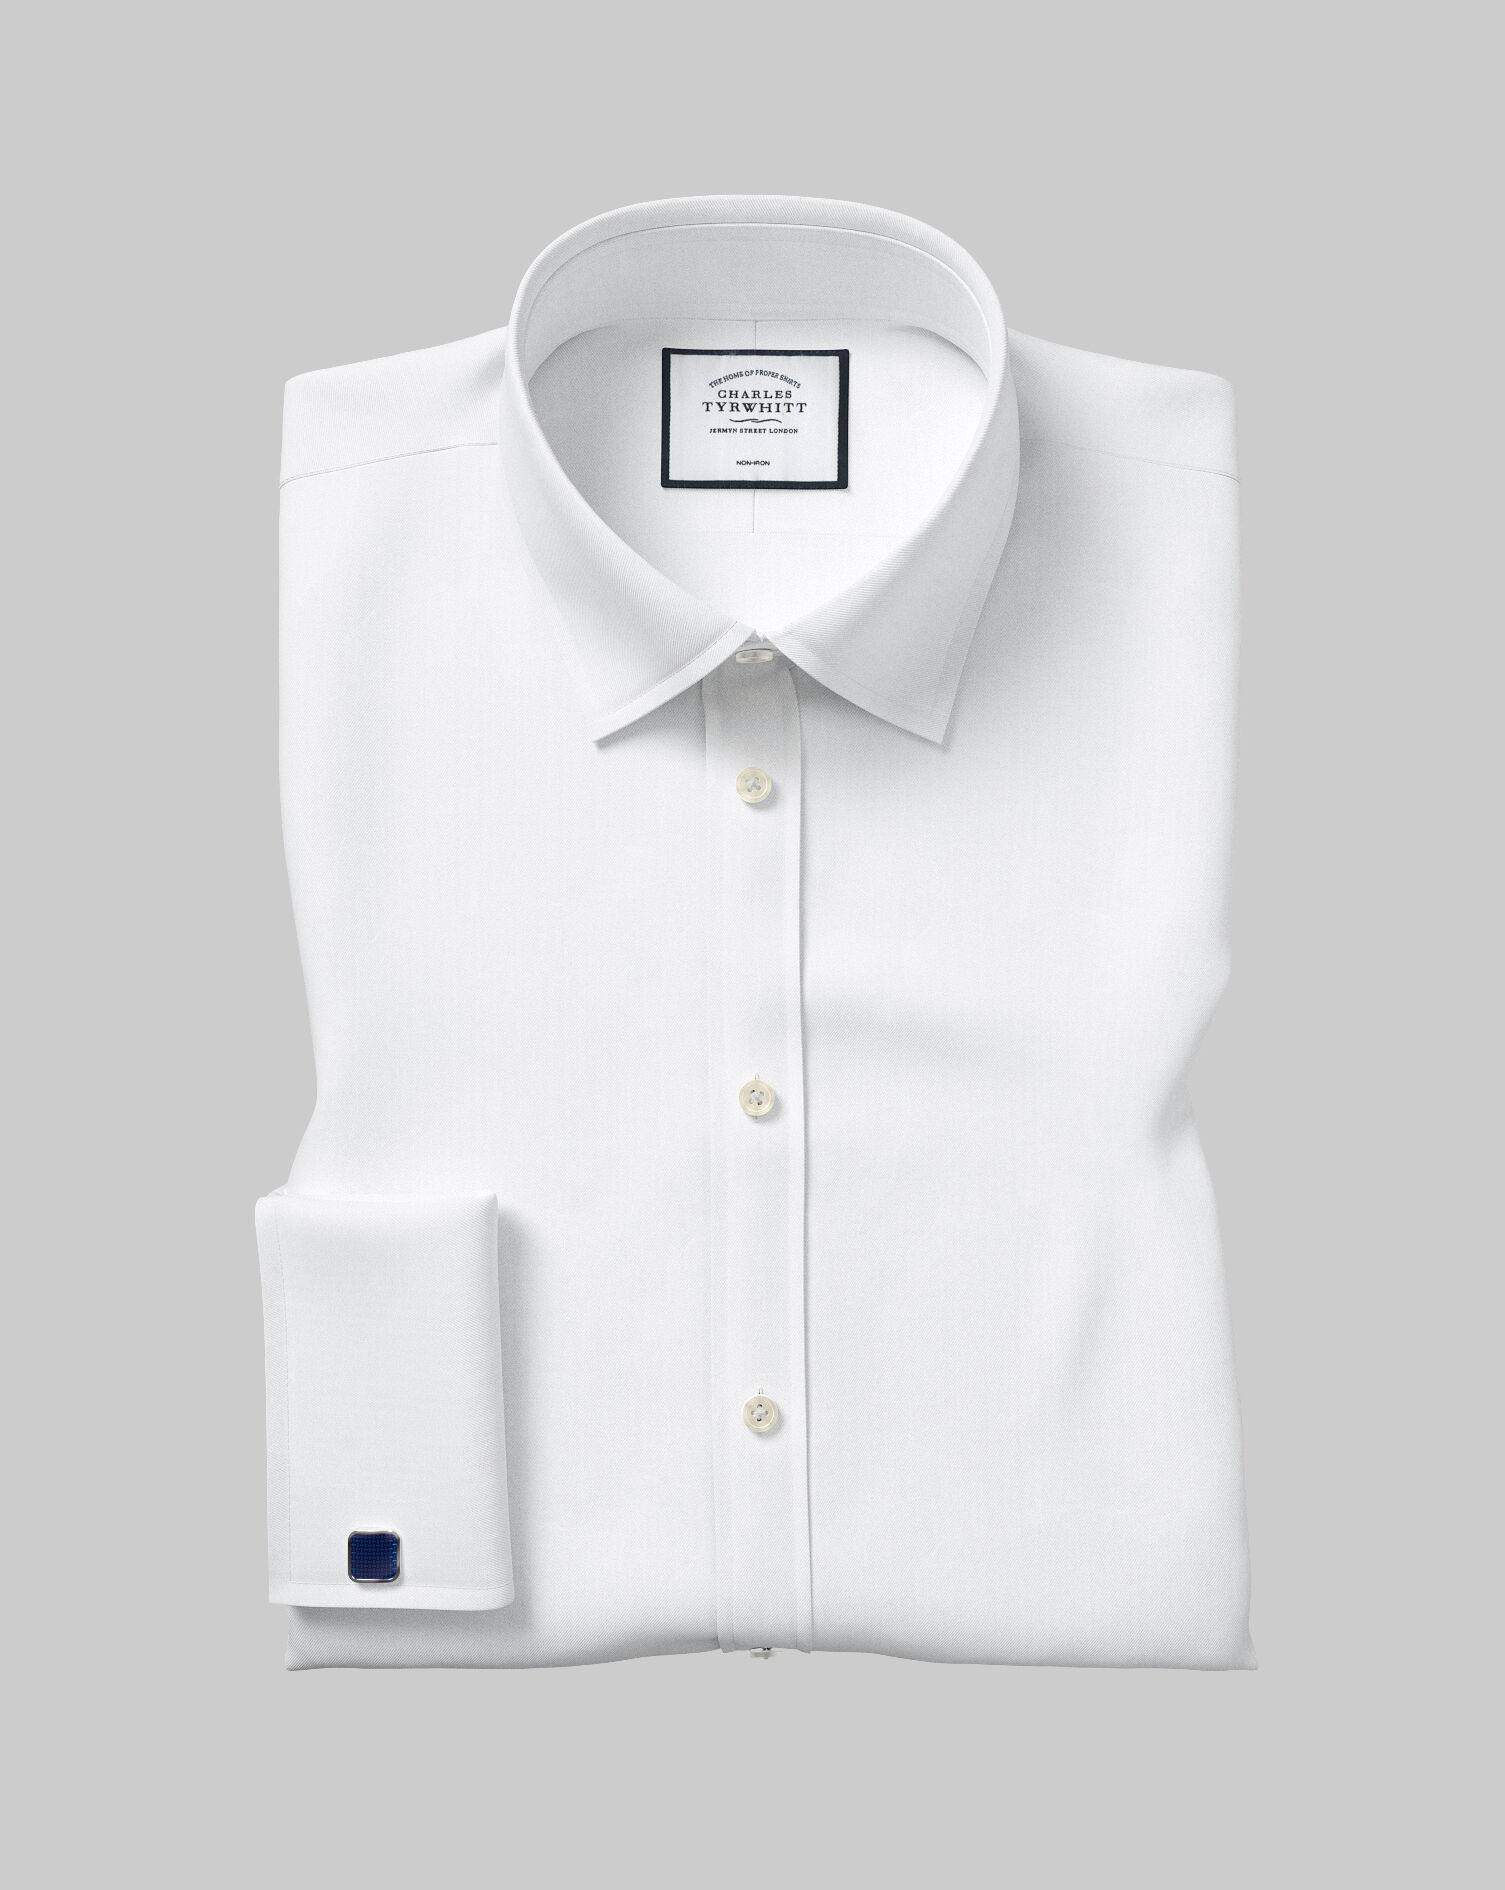 10 weisse Hemden Charles Thyrwitt 41 89